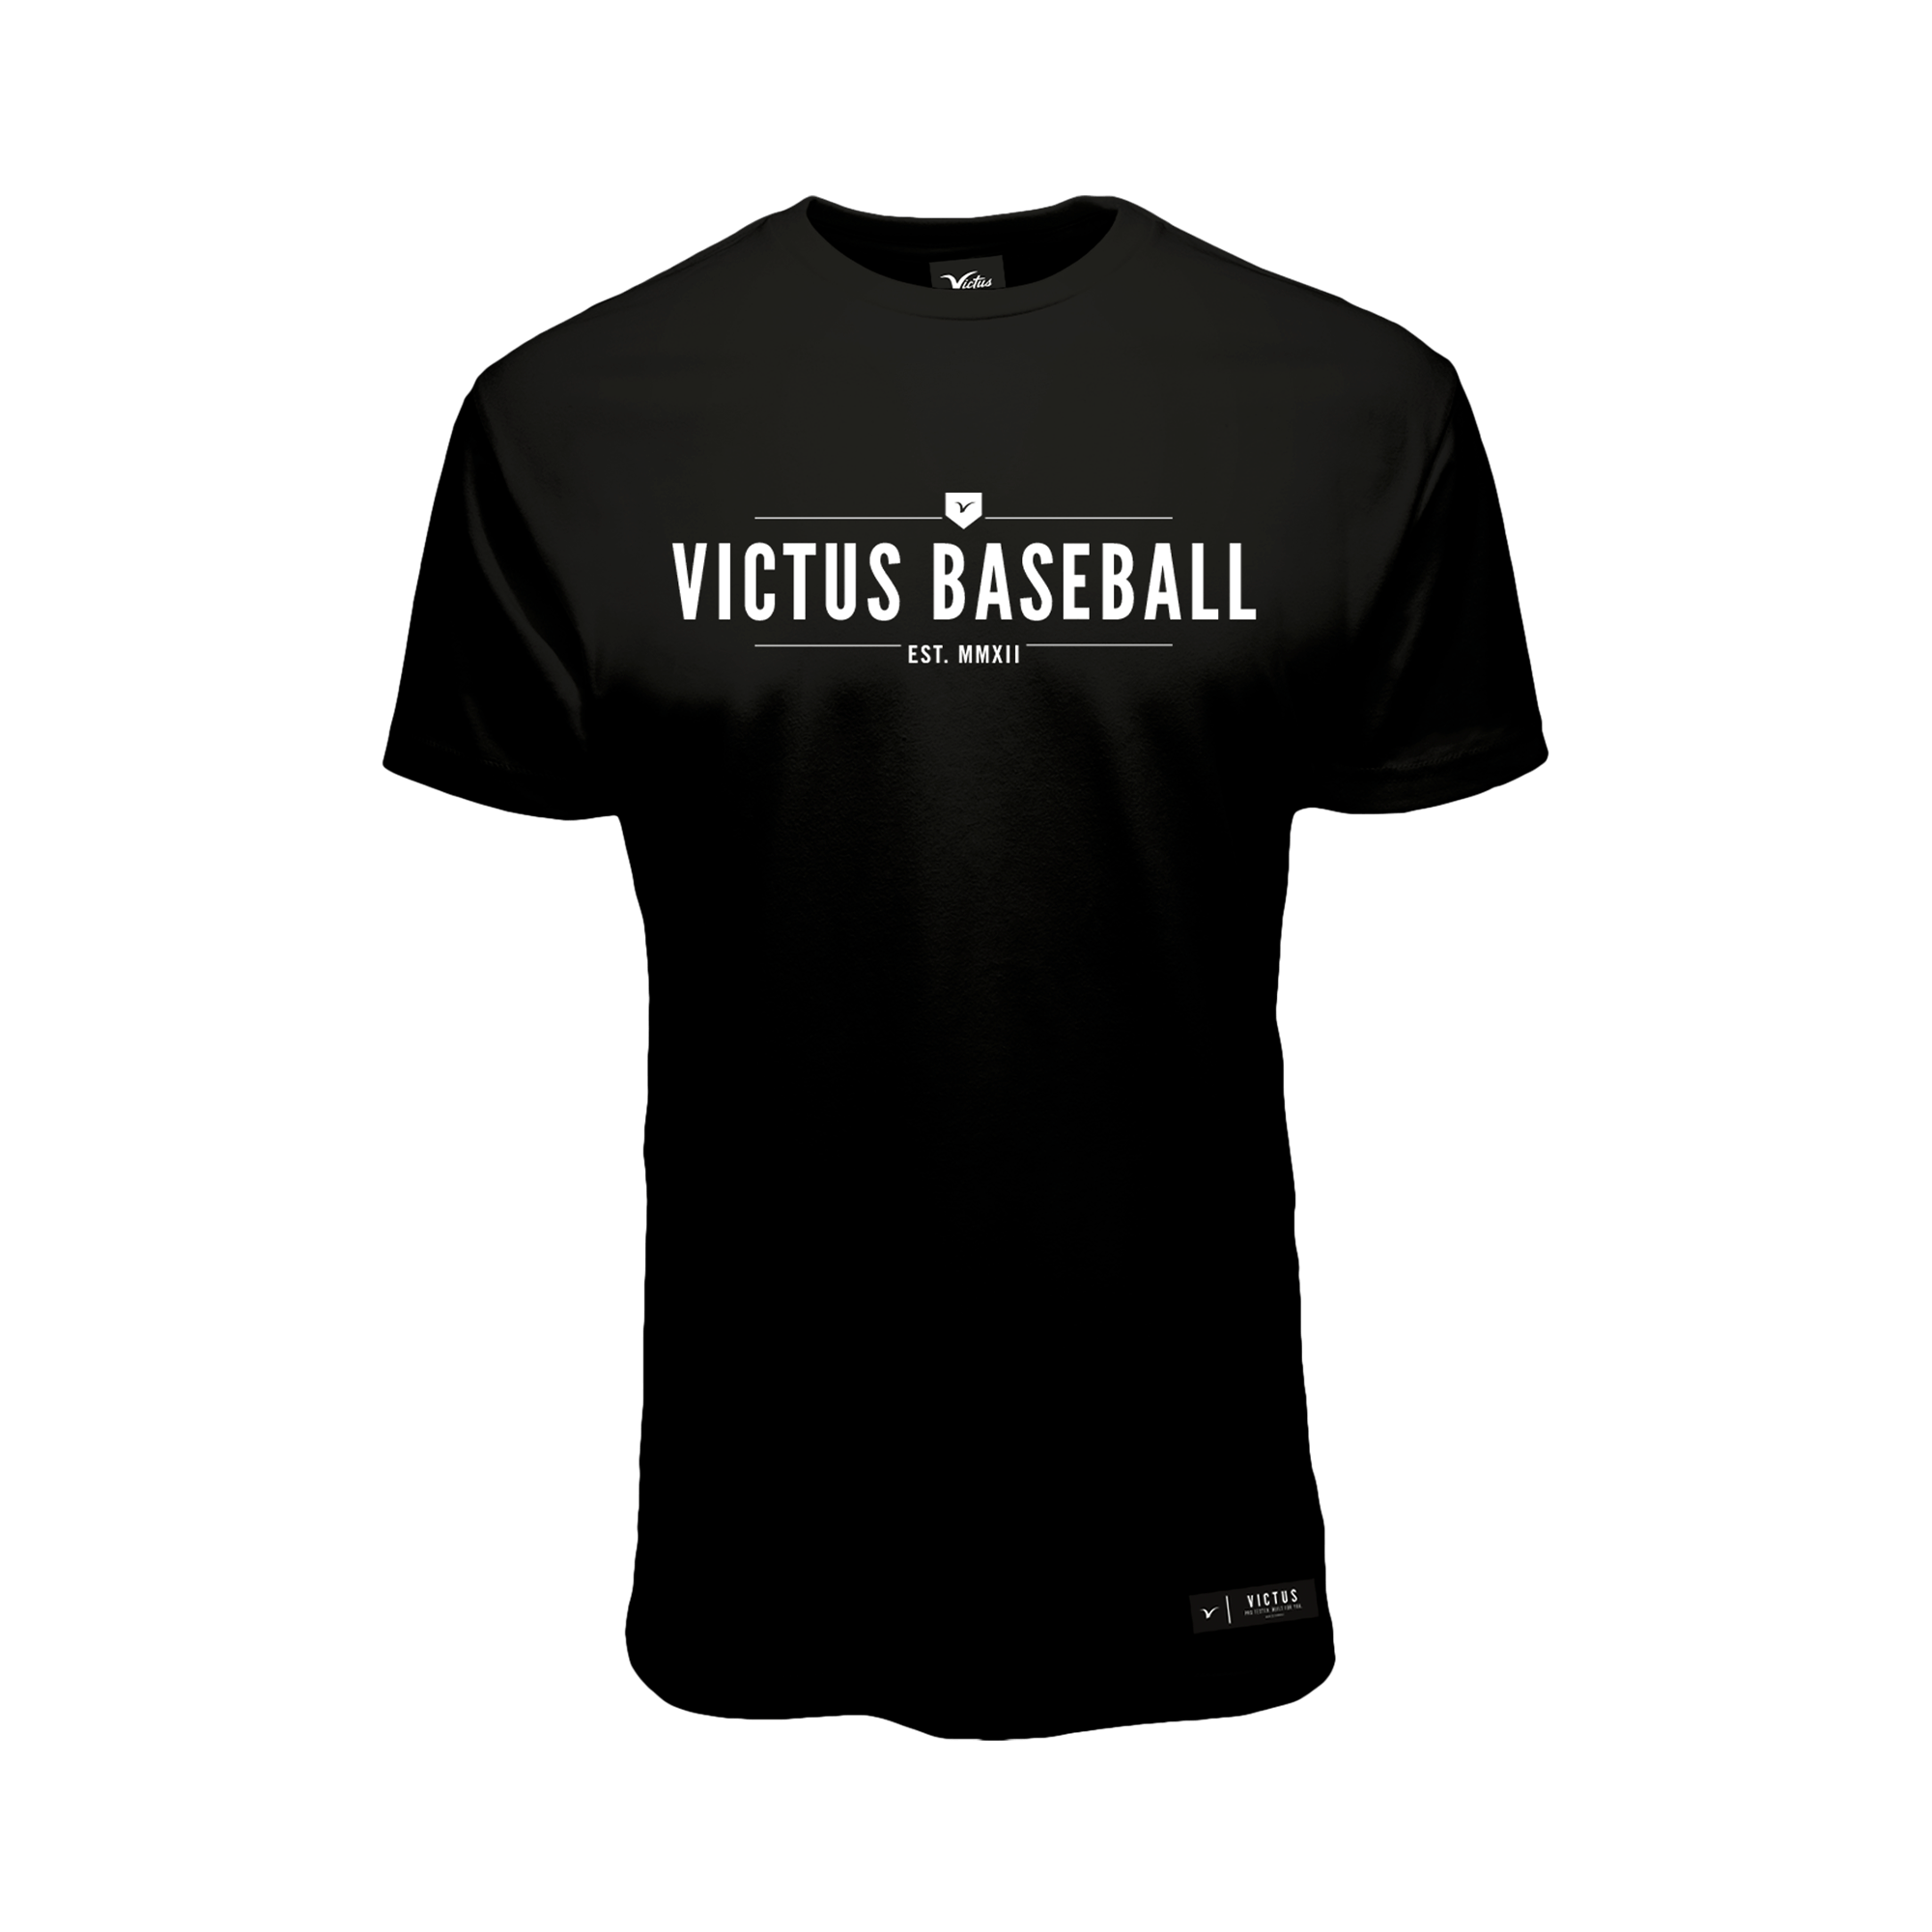 'Victus Baseball 2.0' Tee